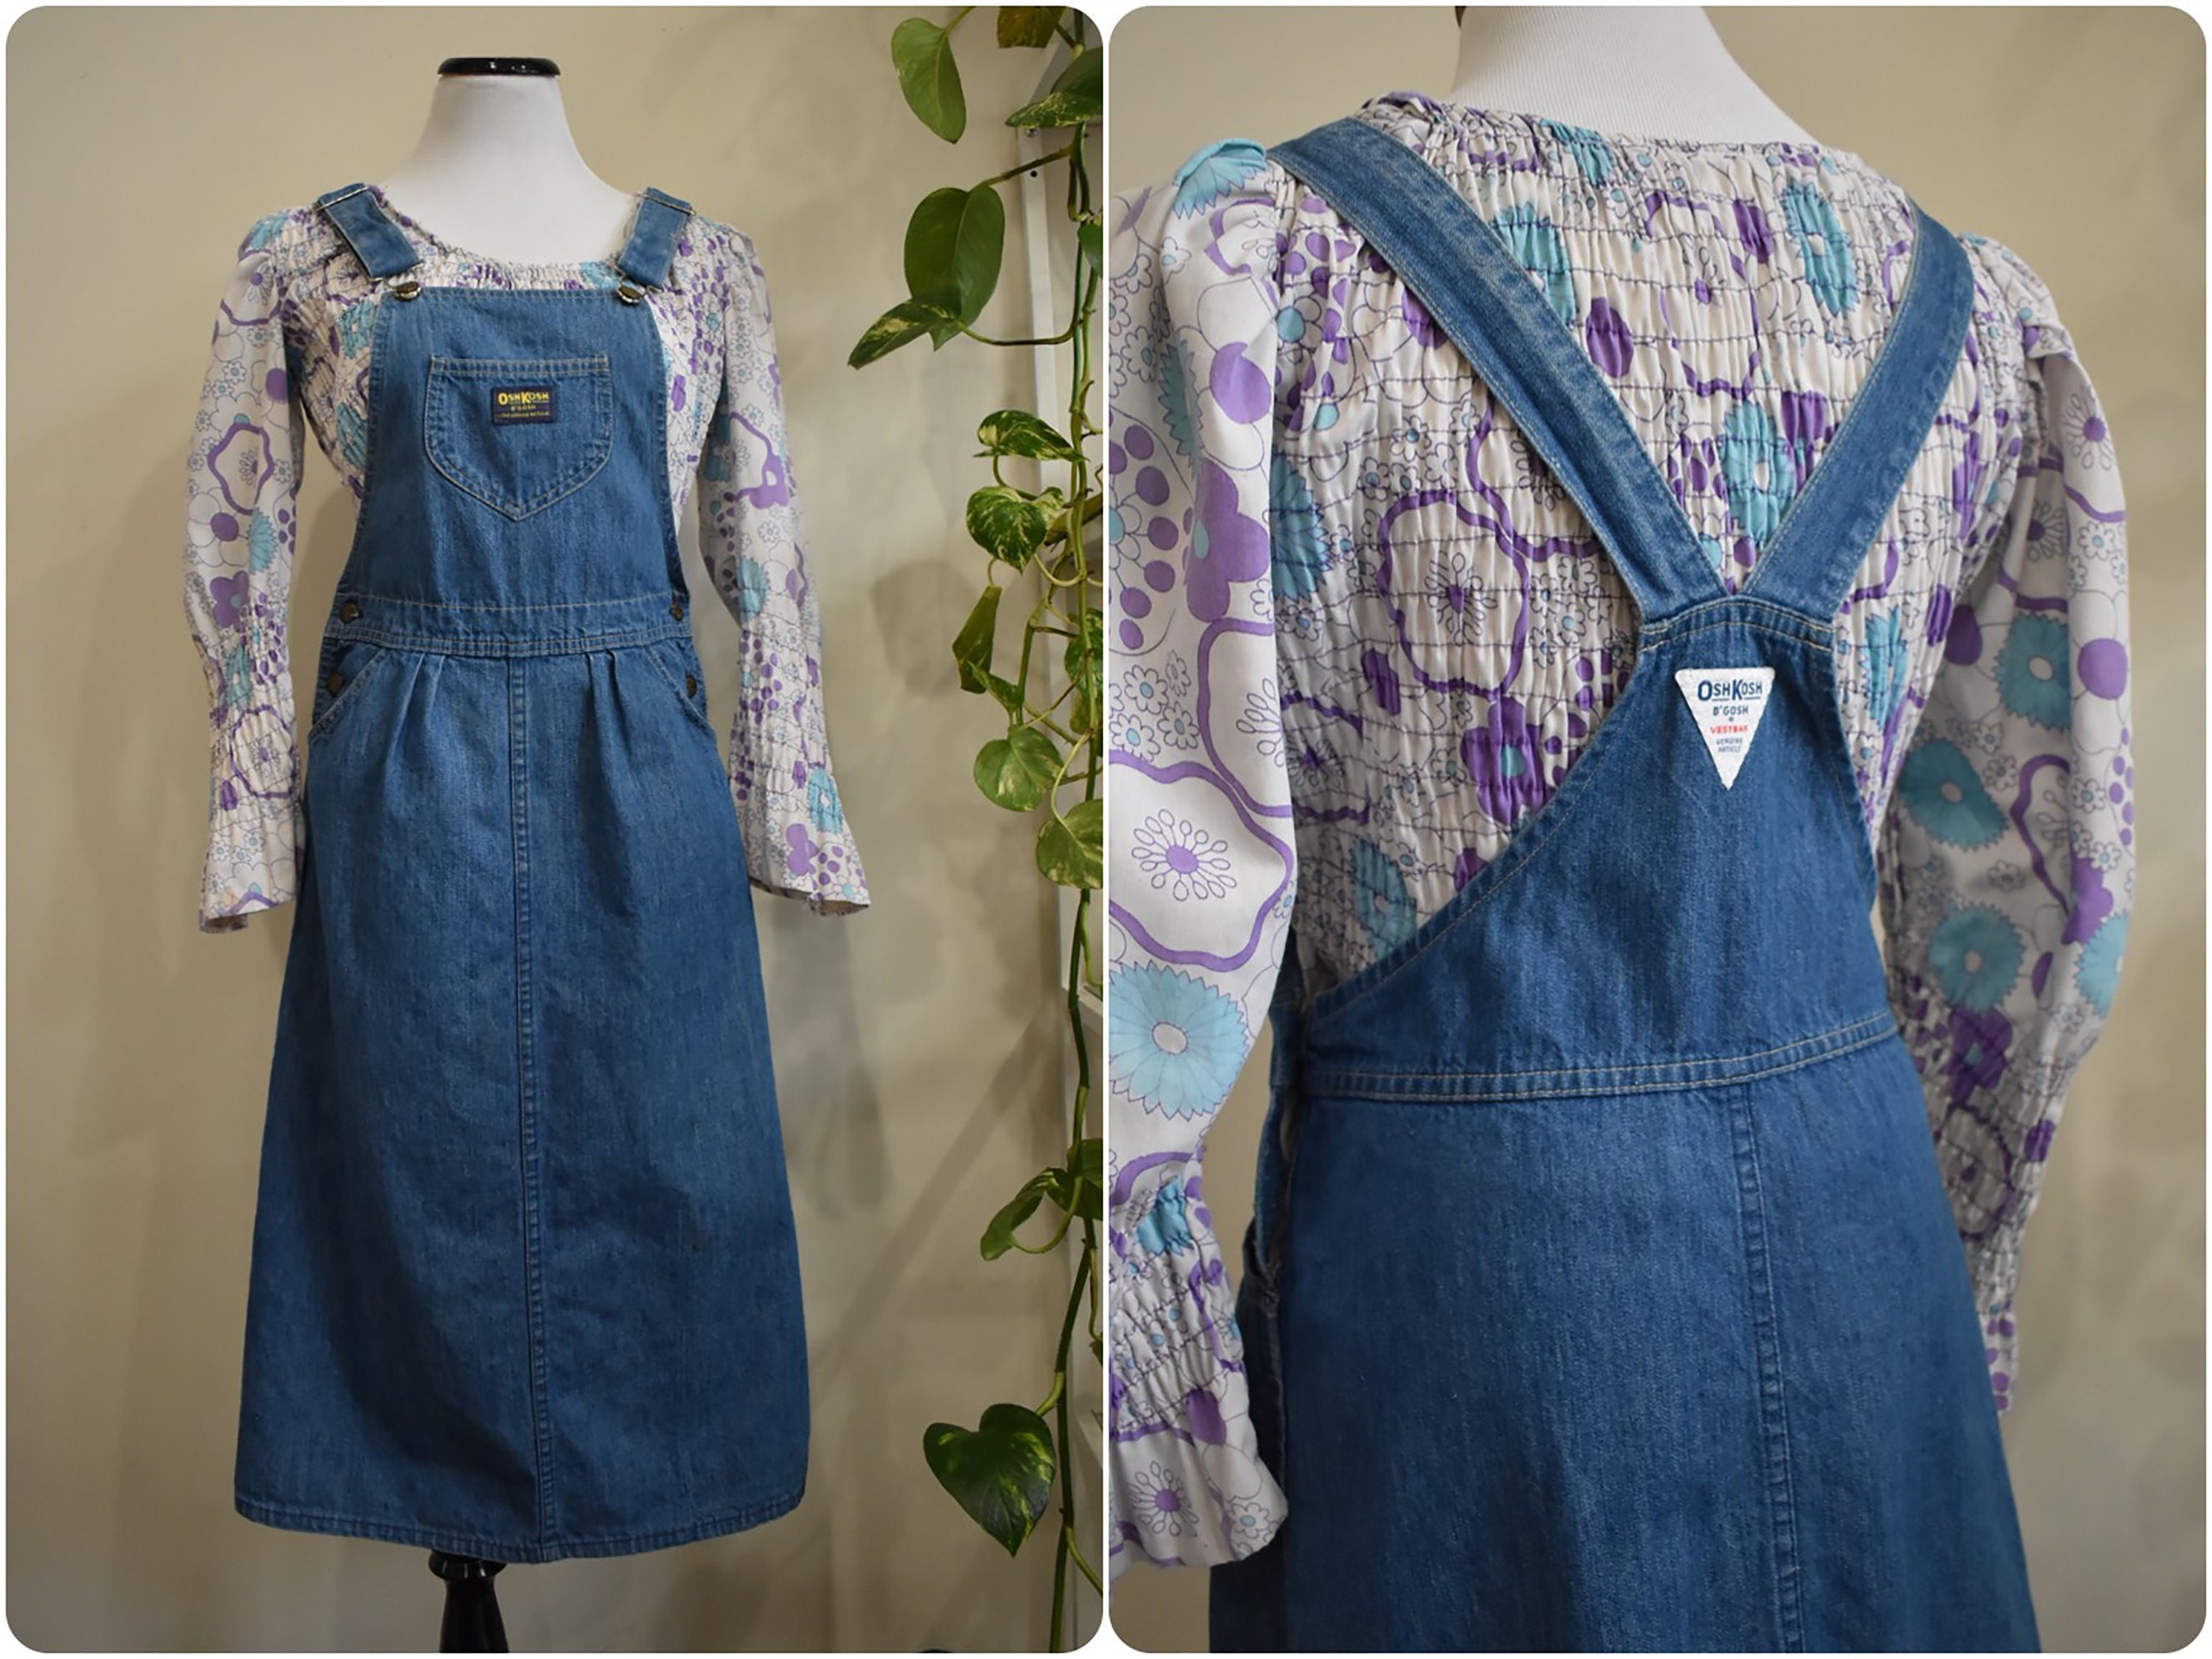 Vintage Overalls & Jumpsuits Vintage 70S Denim Jumper Dress  Oshkosh Bgosh Jean Overalls Small Medium $30.00 AT vintagedancer.com